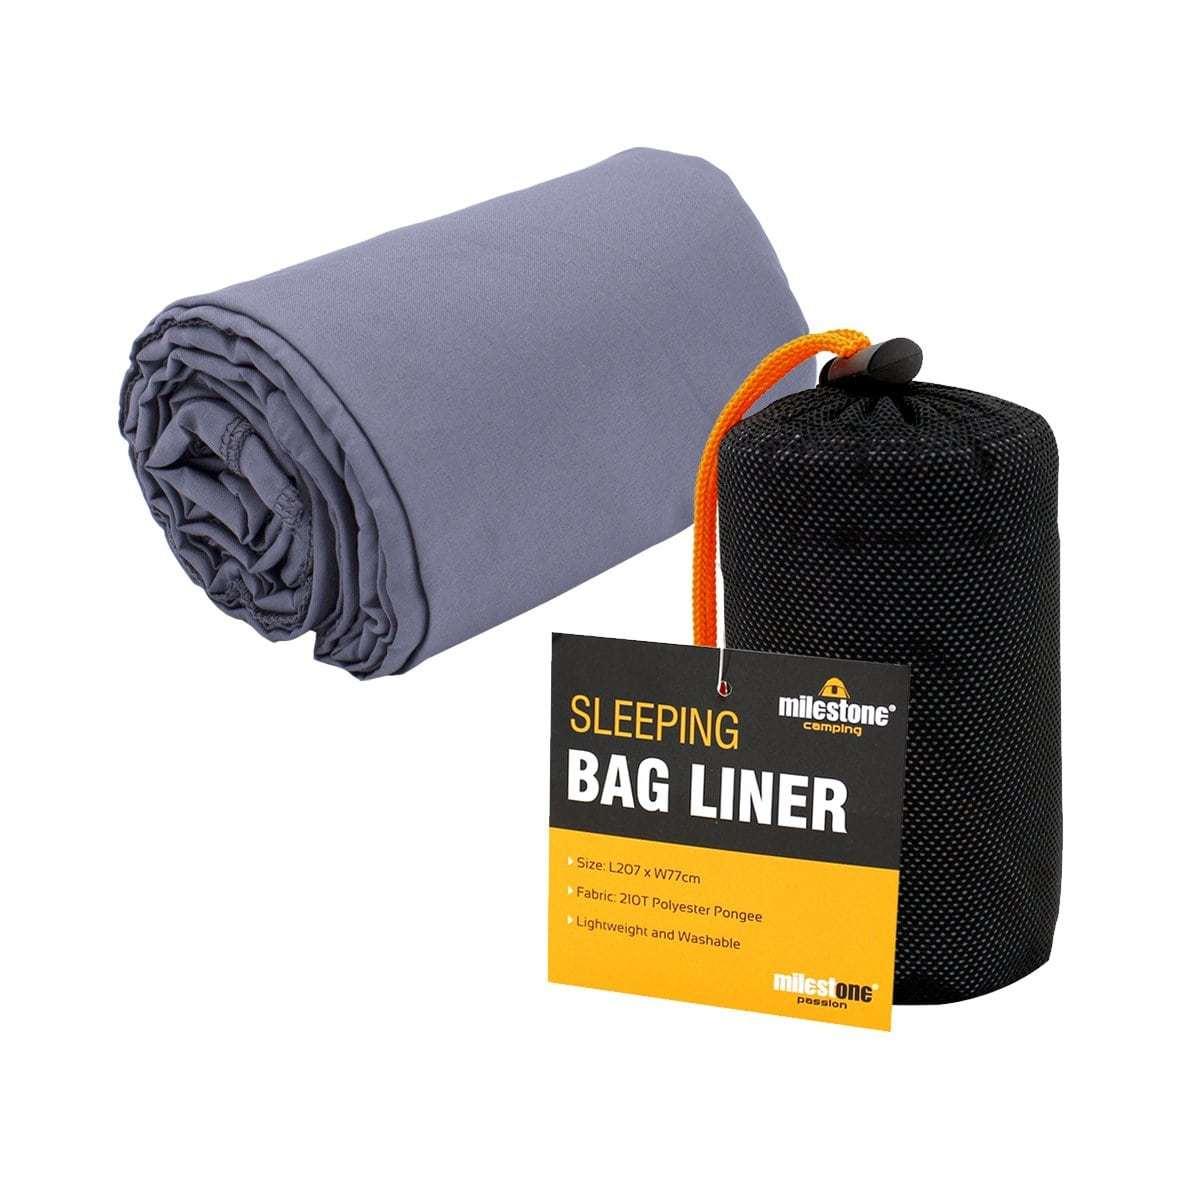 Milestone Camping Summer Sleeping Bag Liner